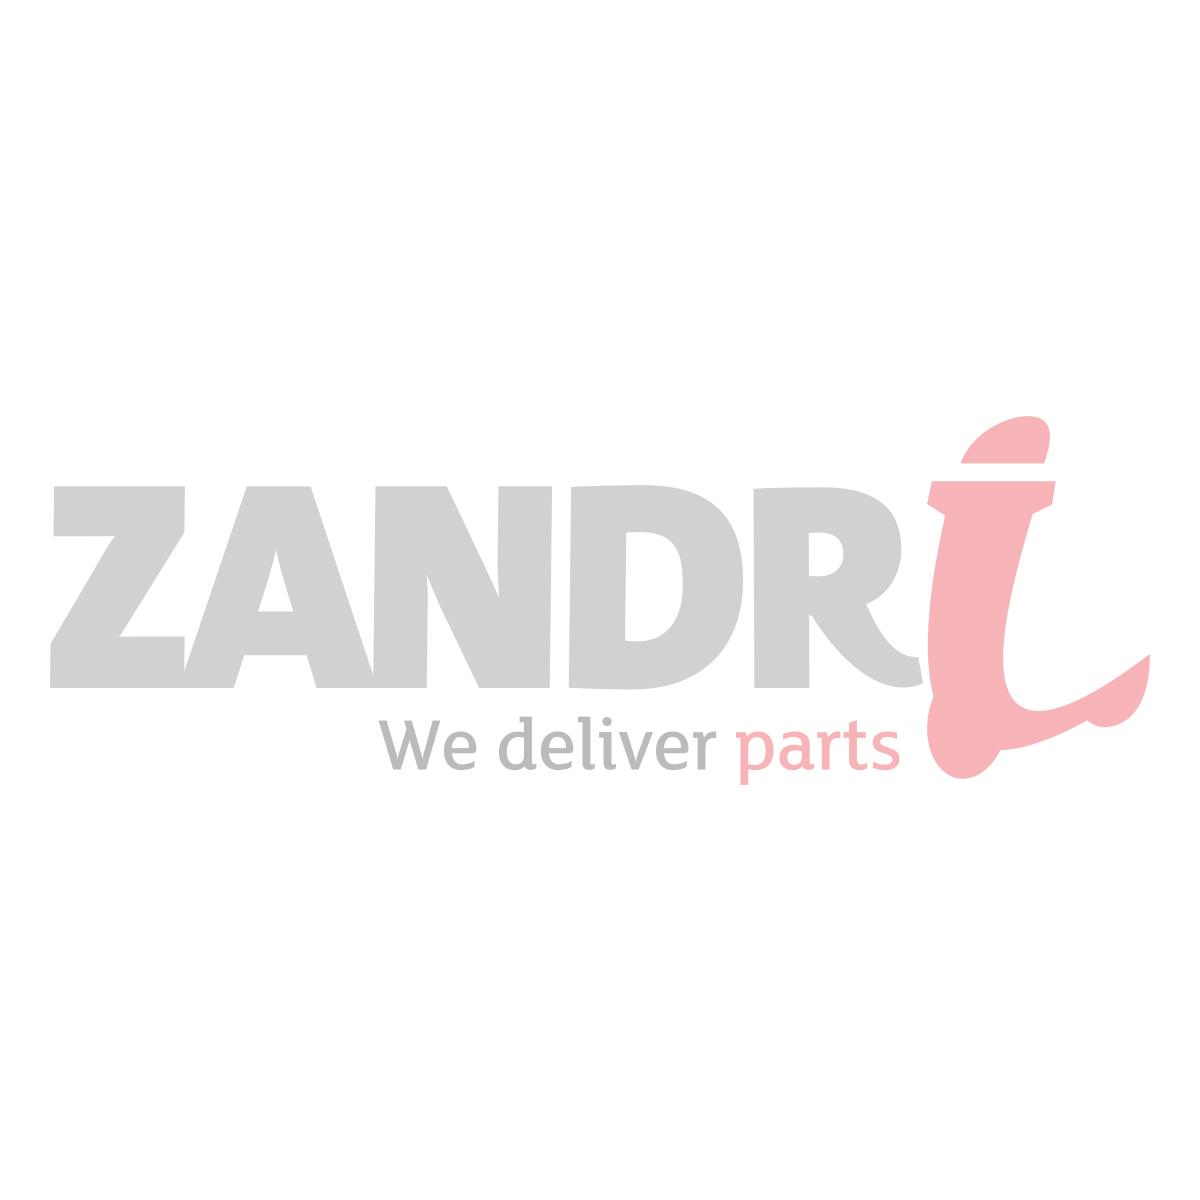 Carburateur / motor cleaner Tecflow